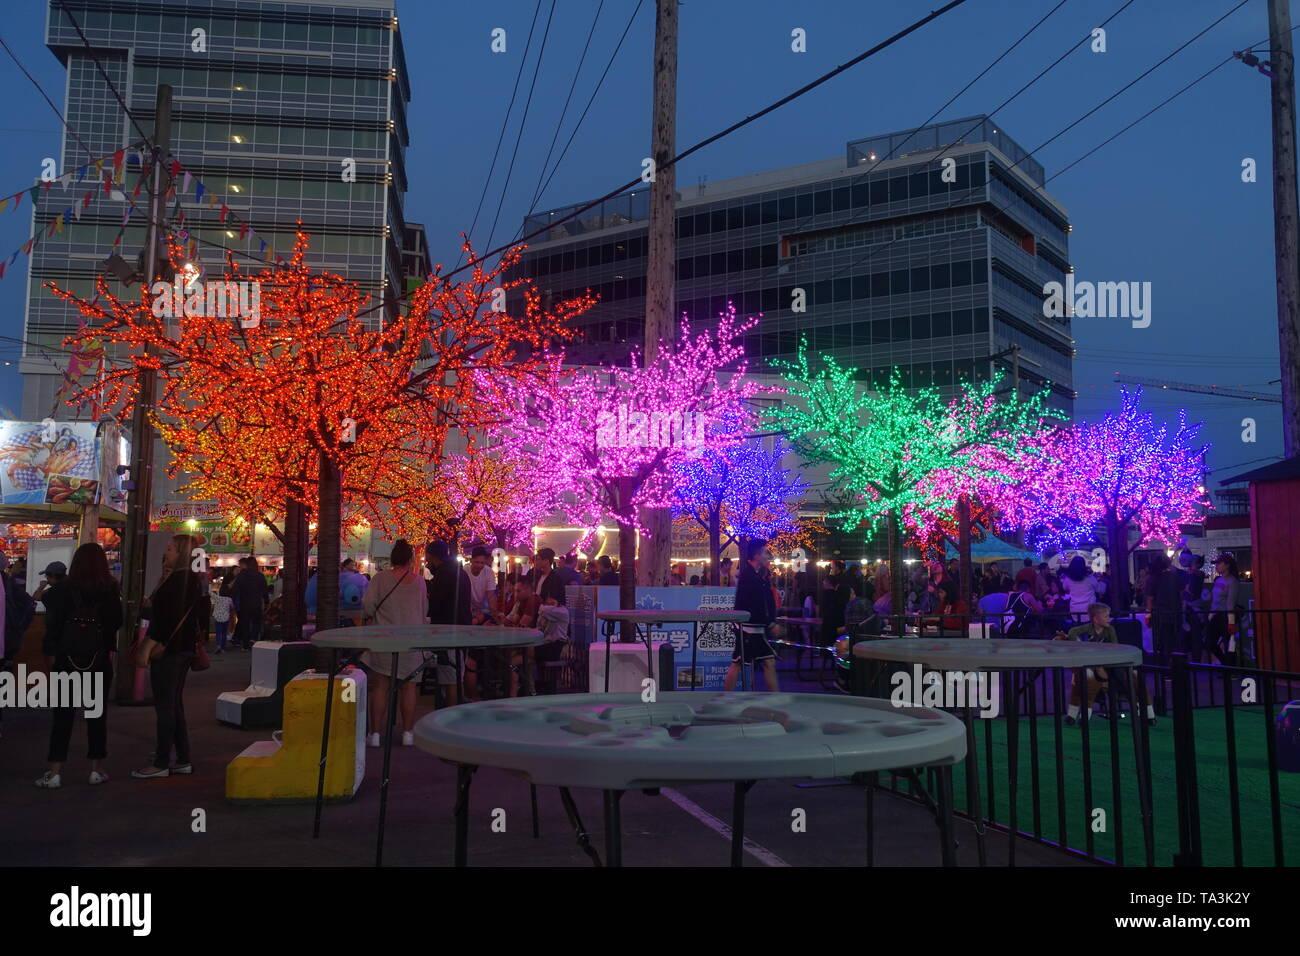 Richmond Night Market colorful Wishing trees 2019 - Stock Image